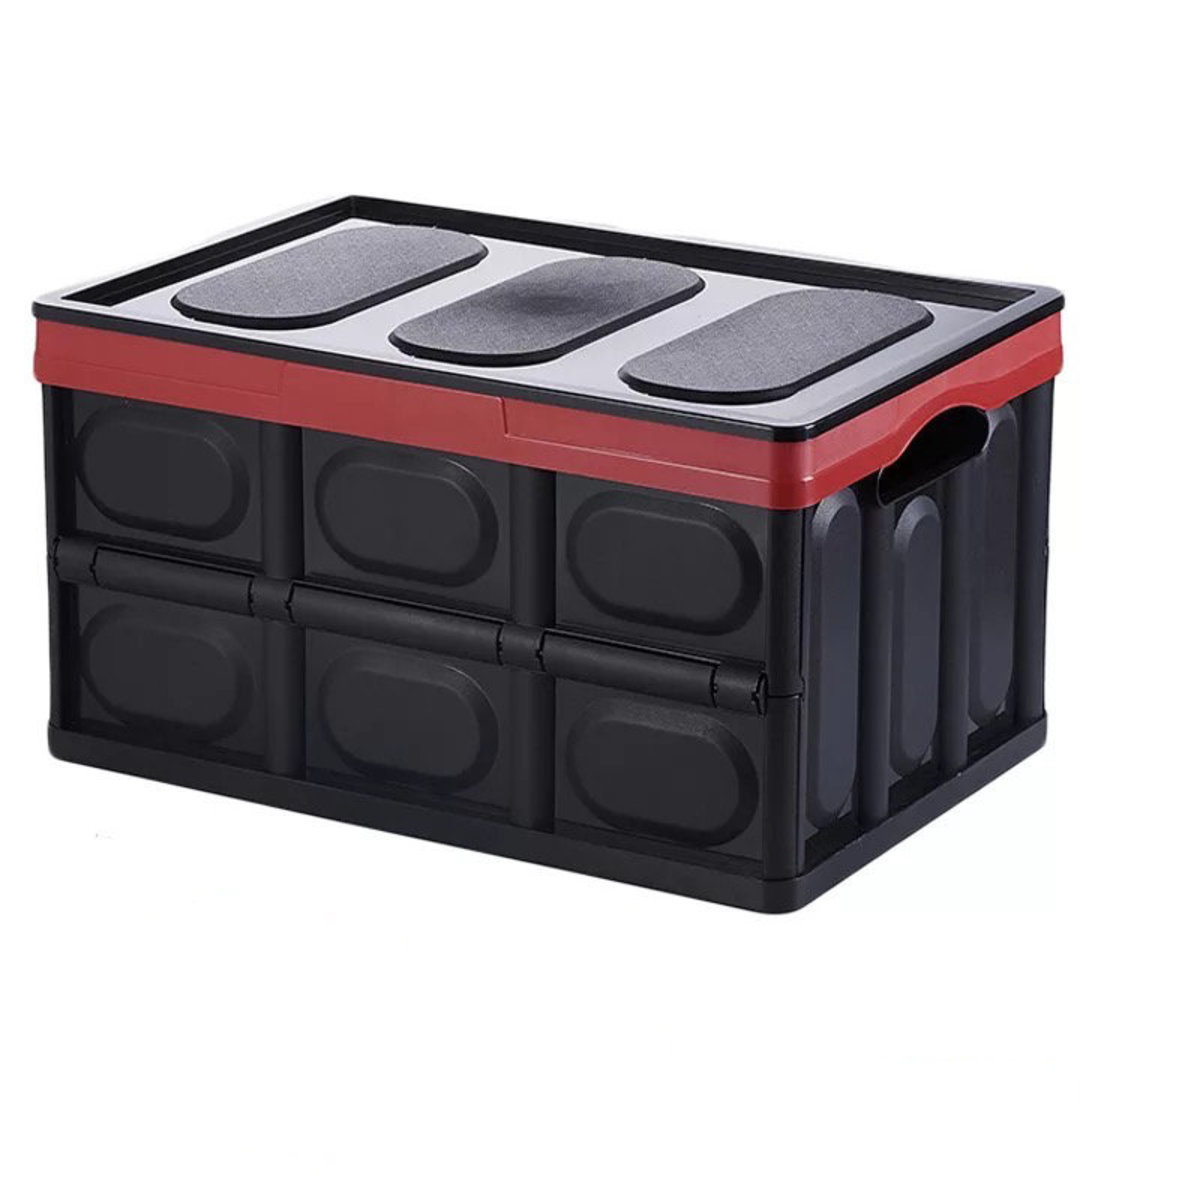 Multi-function Folding Large Storage Box - Black